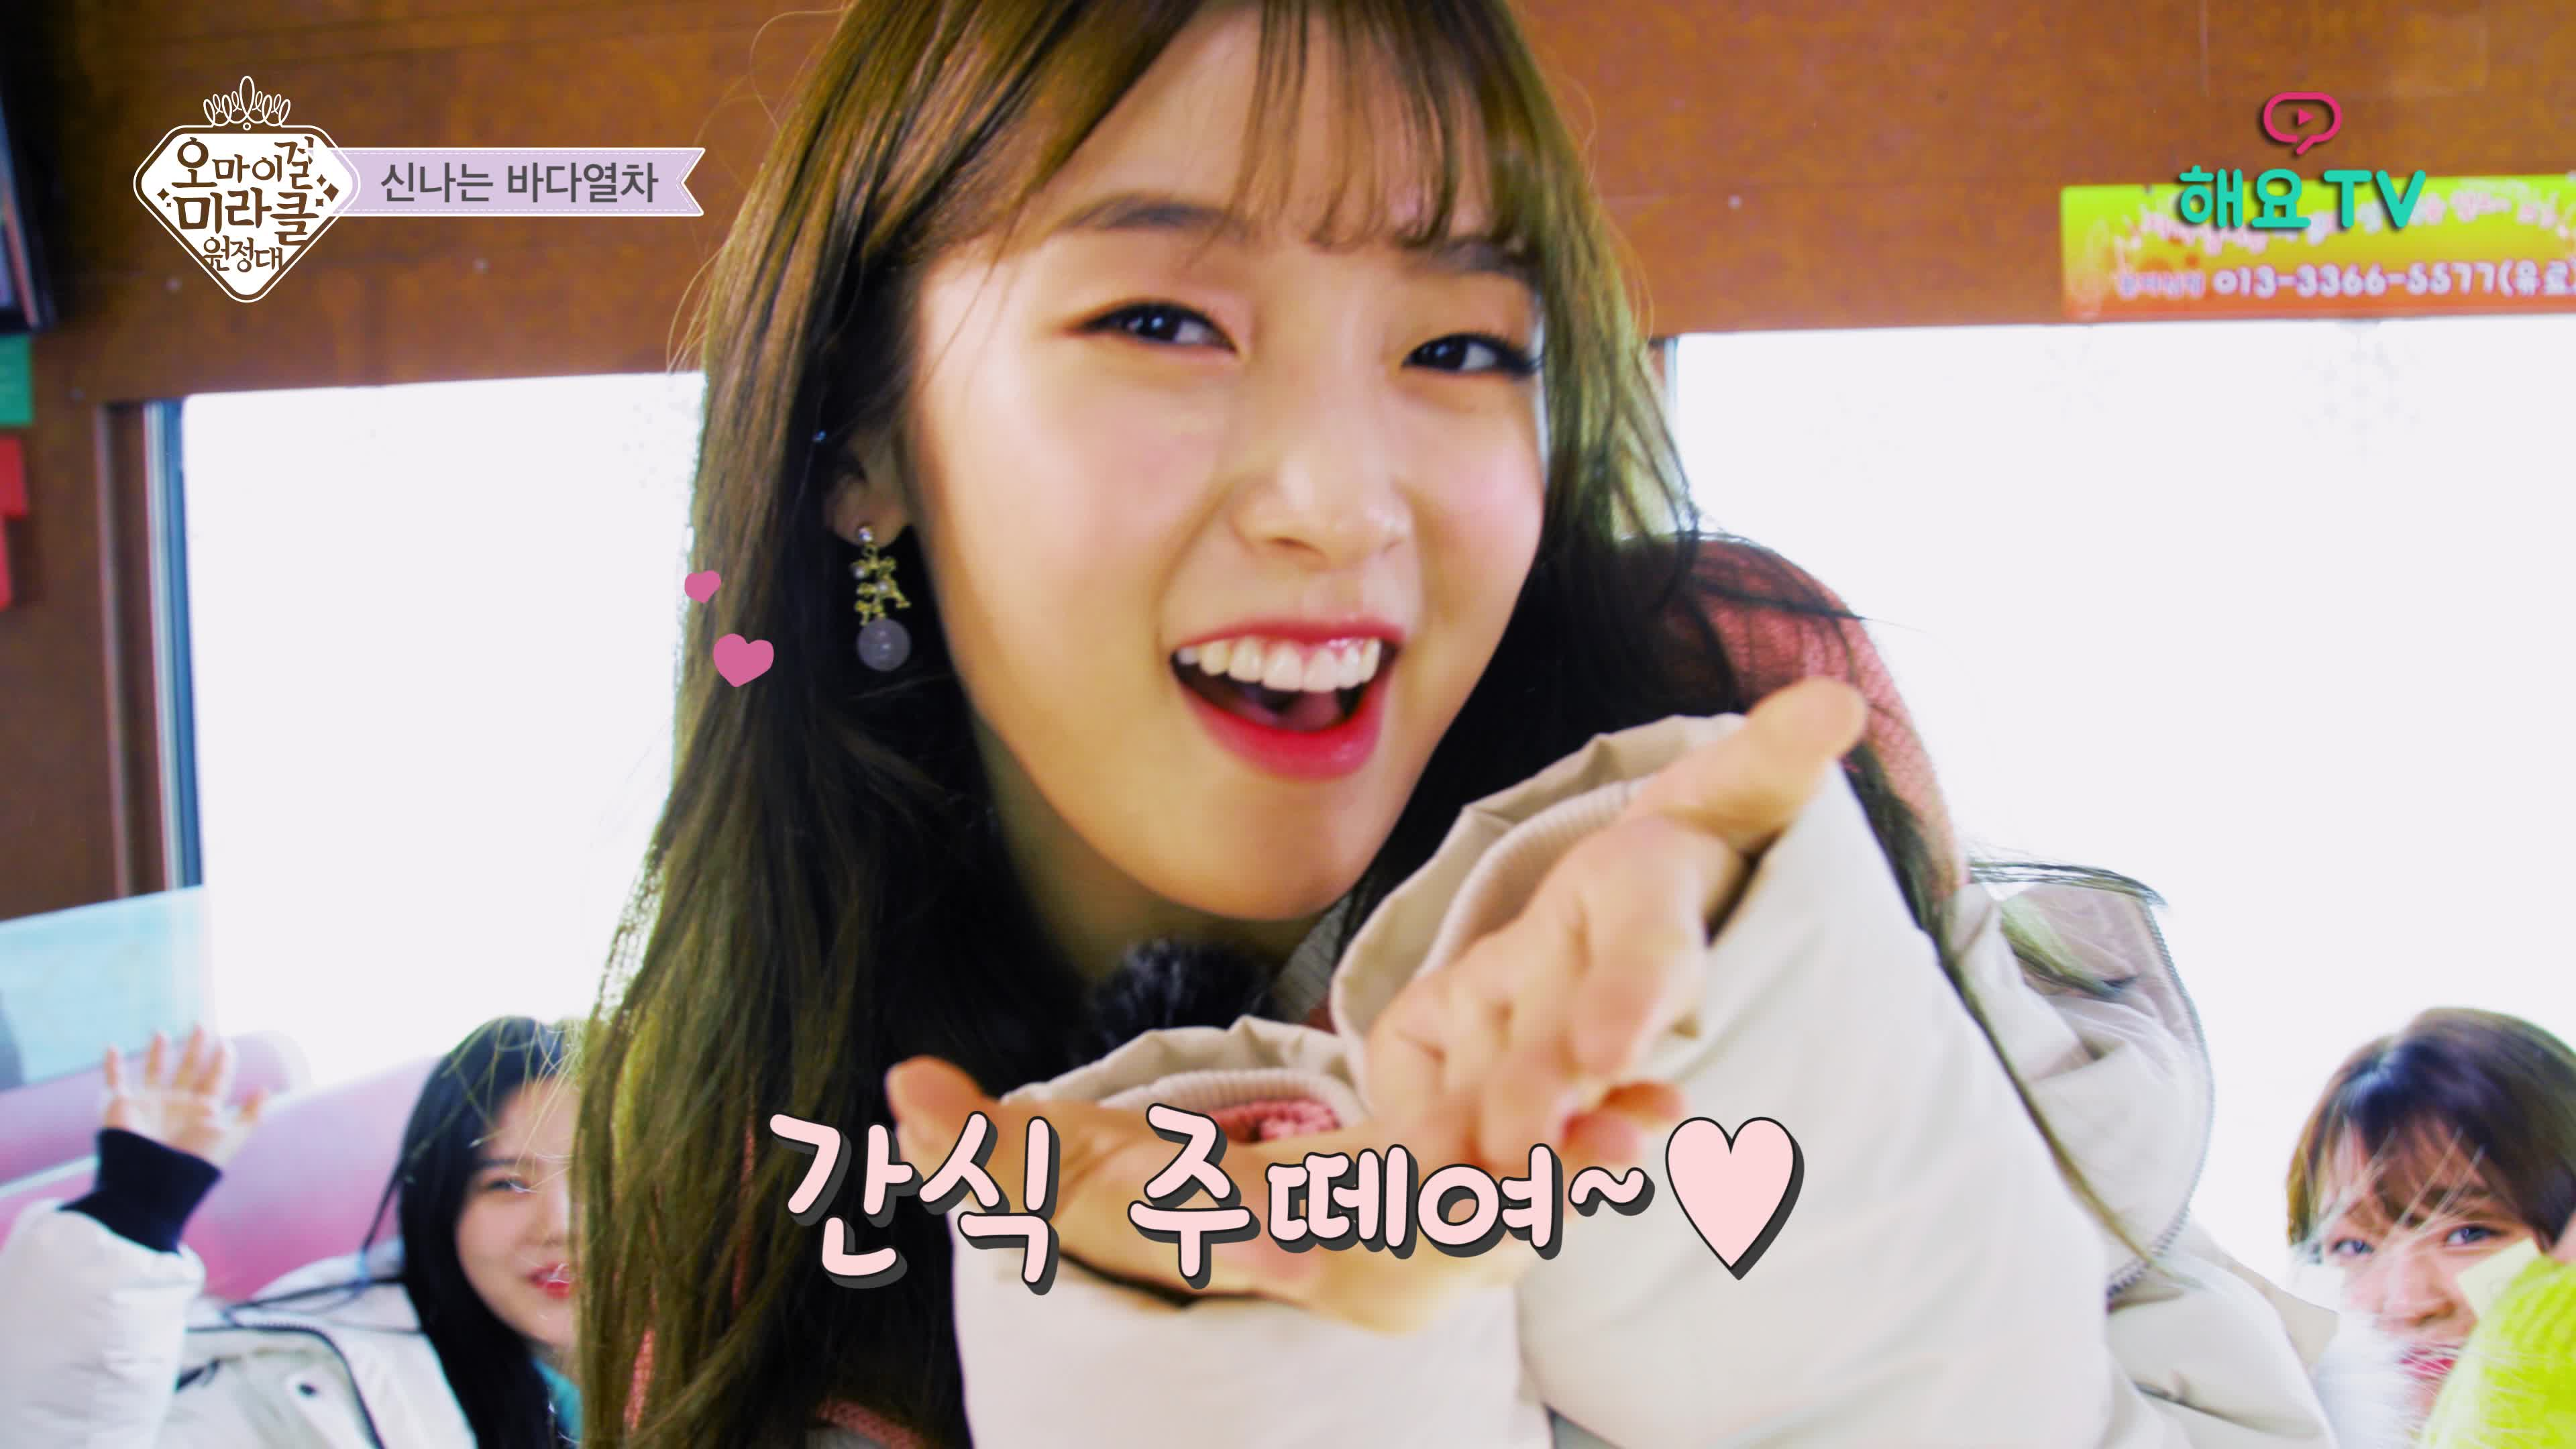 [FULL] EP. 8 OH MY GIRL - 오마이걸 미라클원정대 : 바다열차를 탄 오마이걸